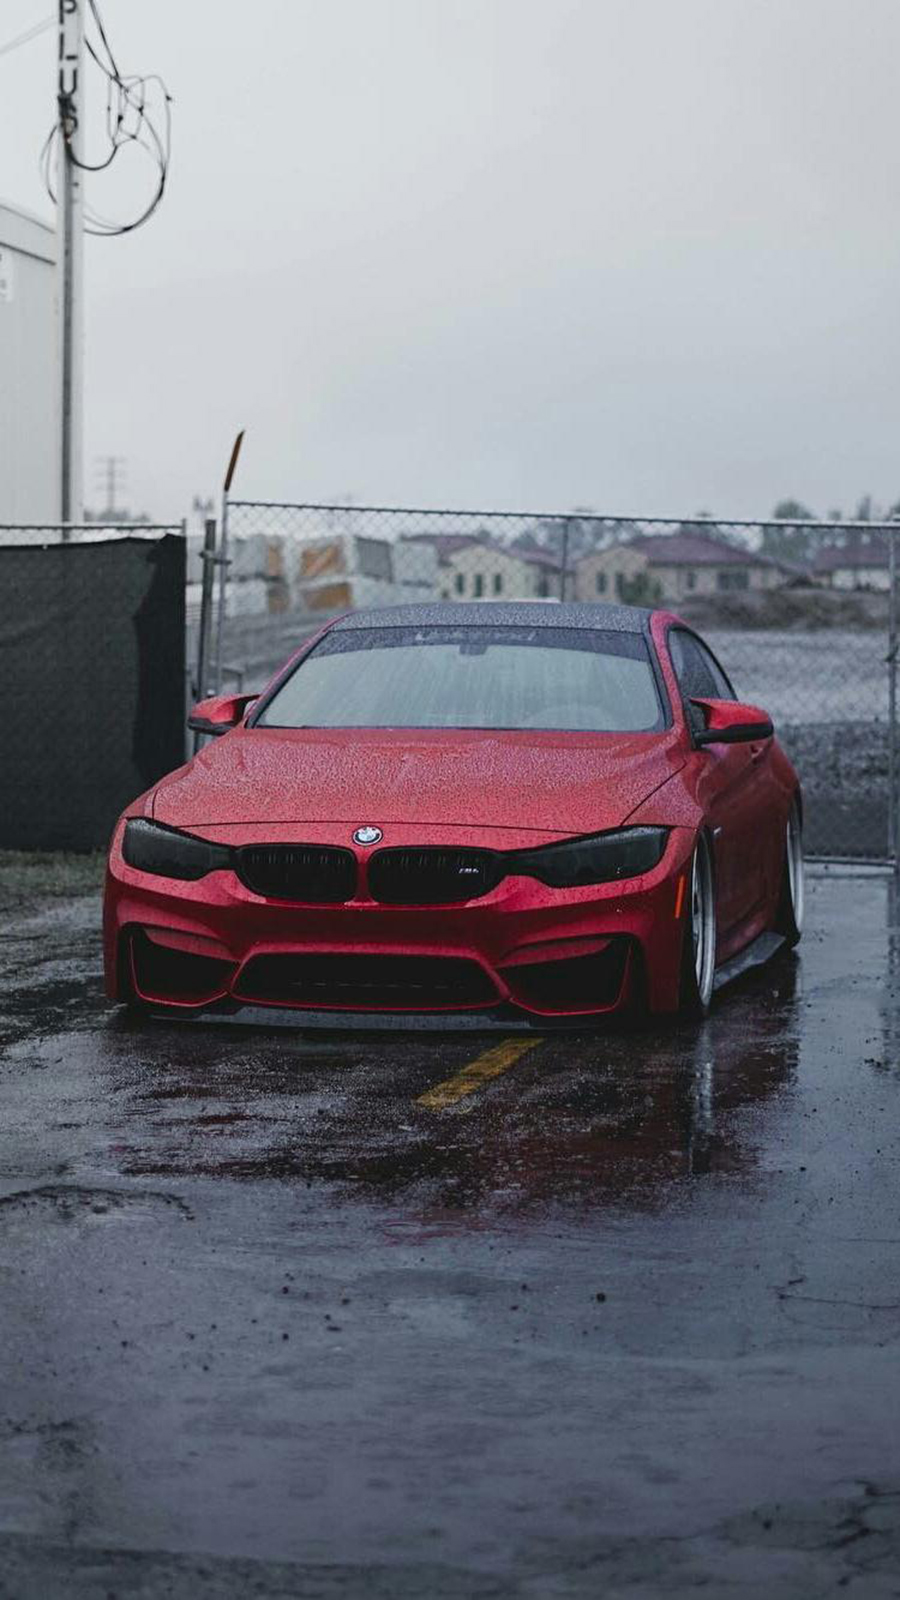 Bmw Wallpaper – BMW M3 Best Wallpapers Free Download